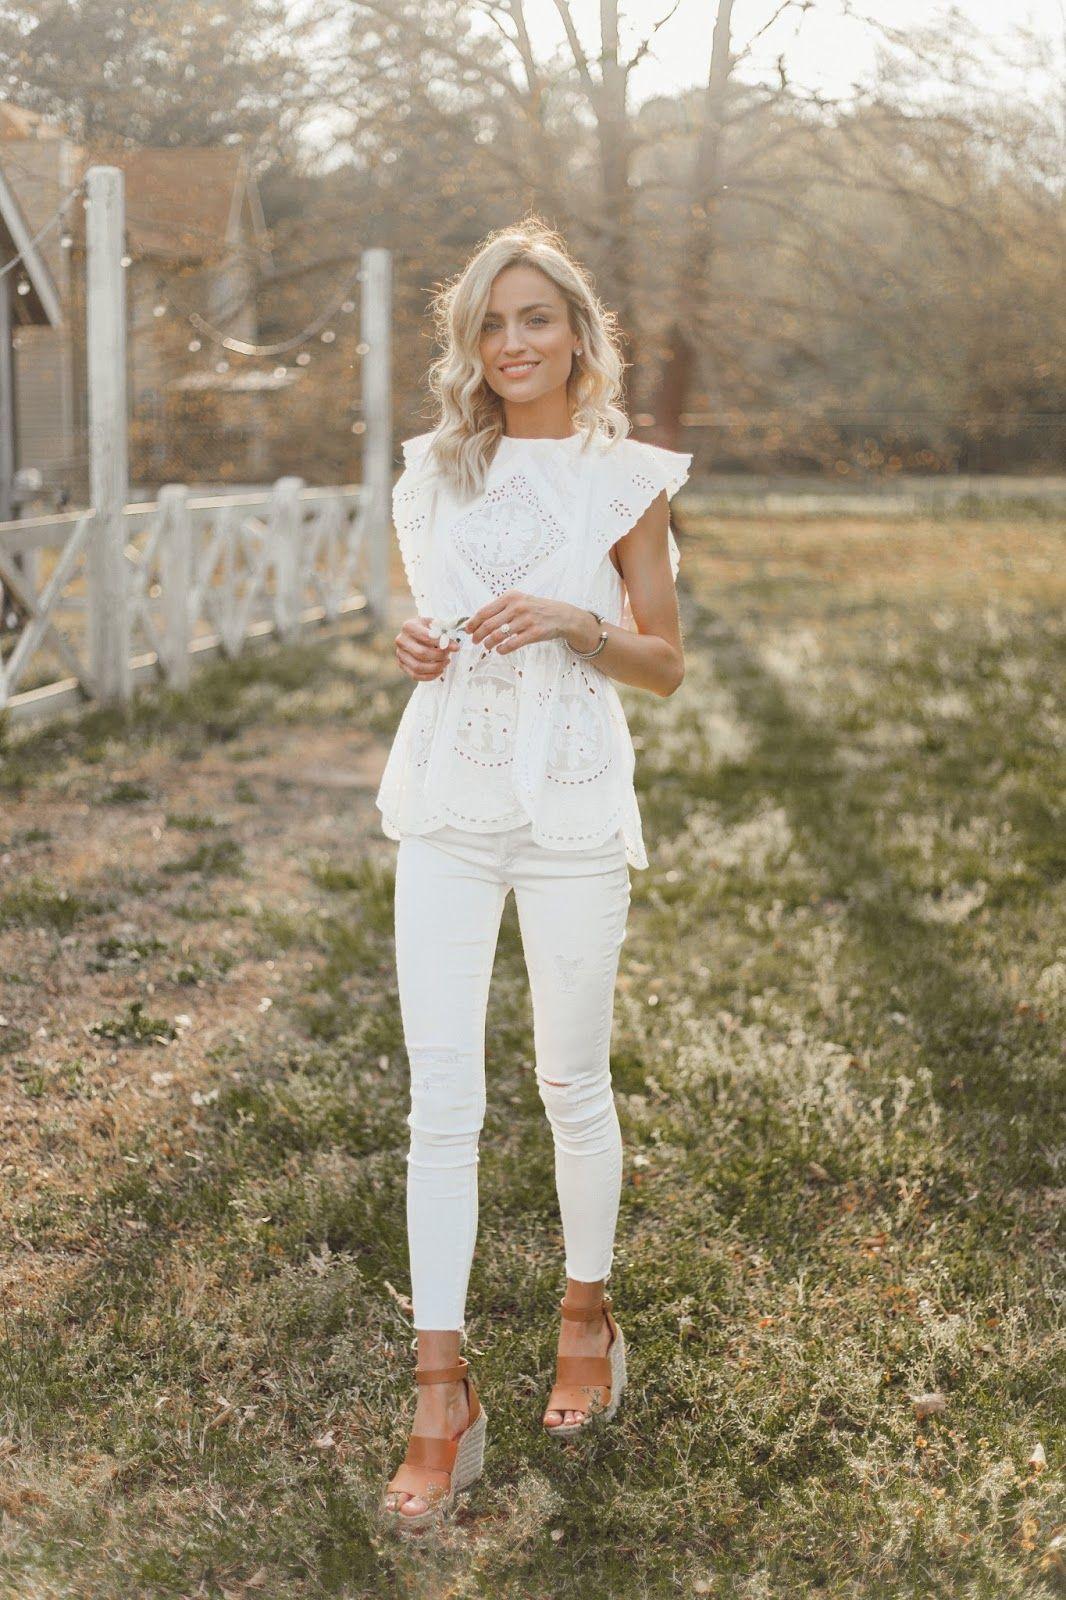 Shelby Stockton Dating blog